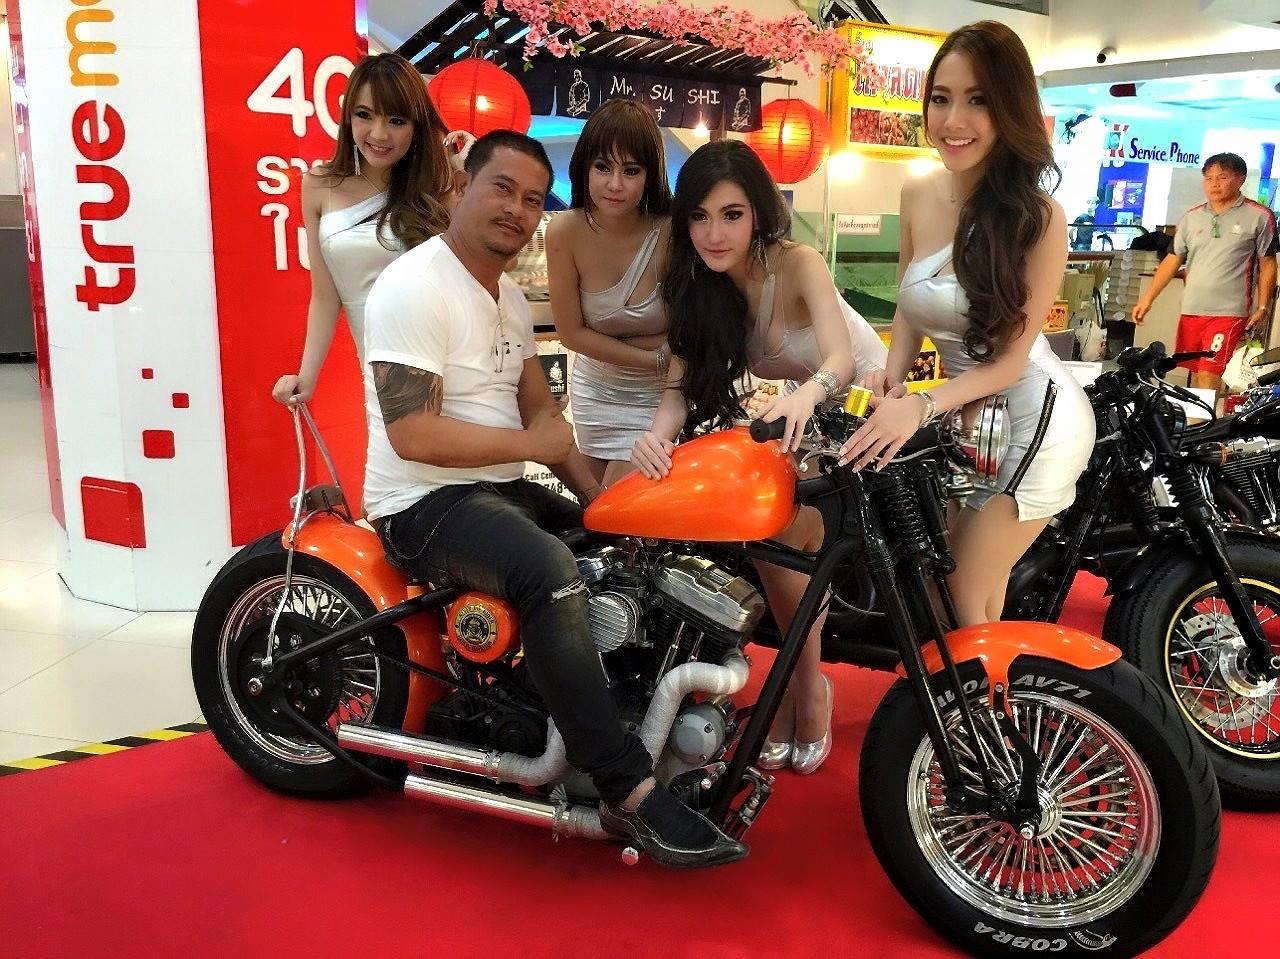 Les tribulations d'un road king en Thailand  - Page 4 173470117138998927424707988028969646984340694682o